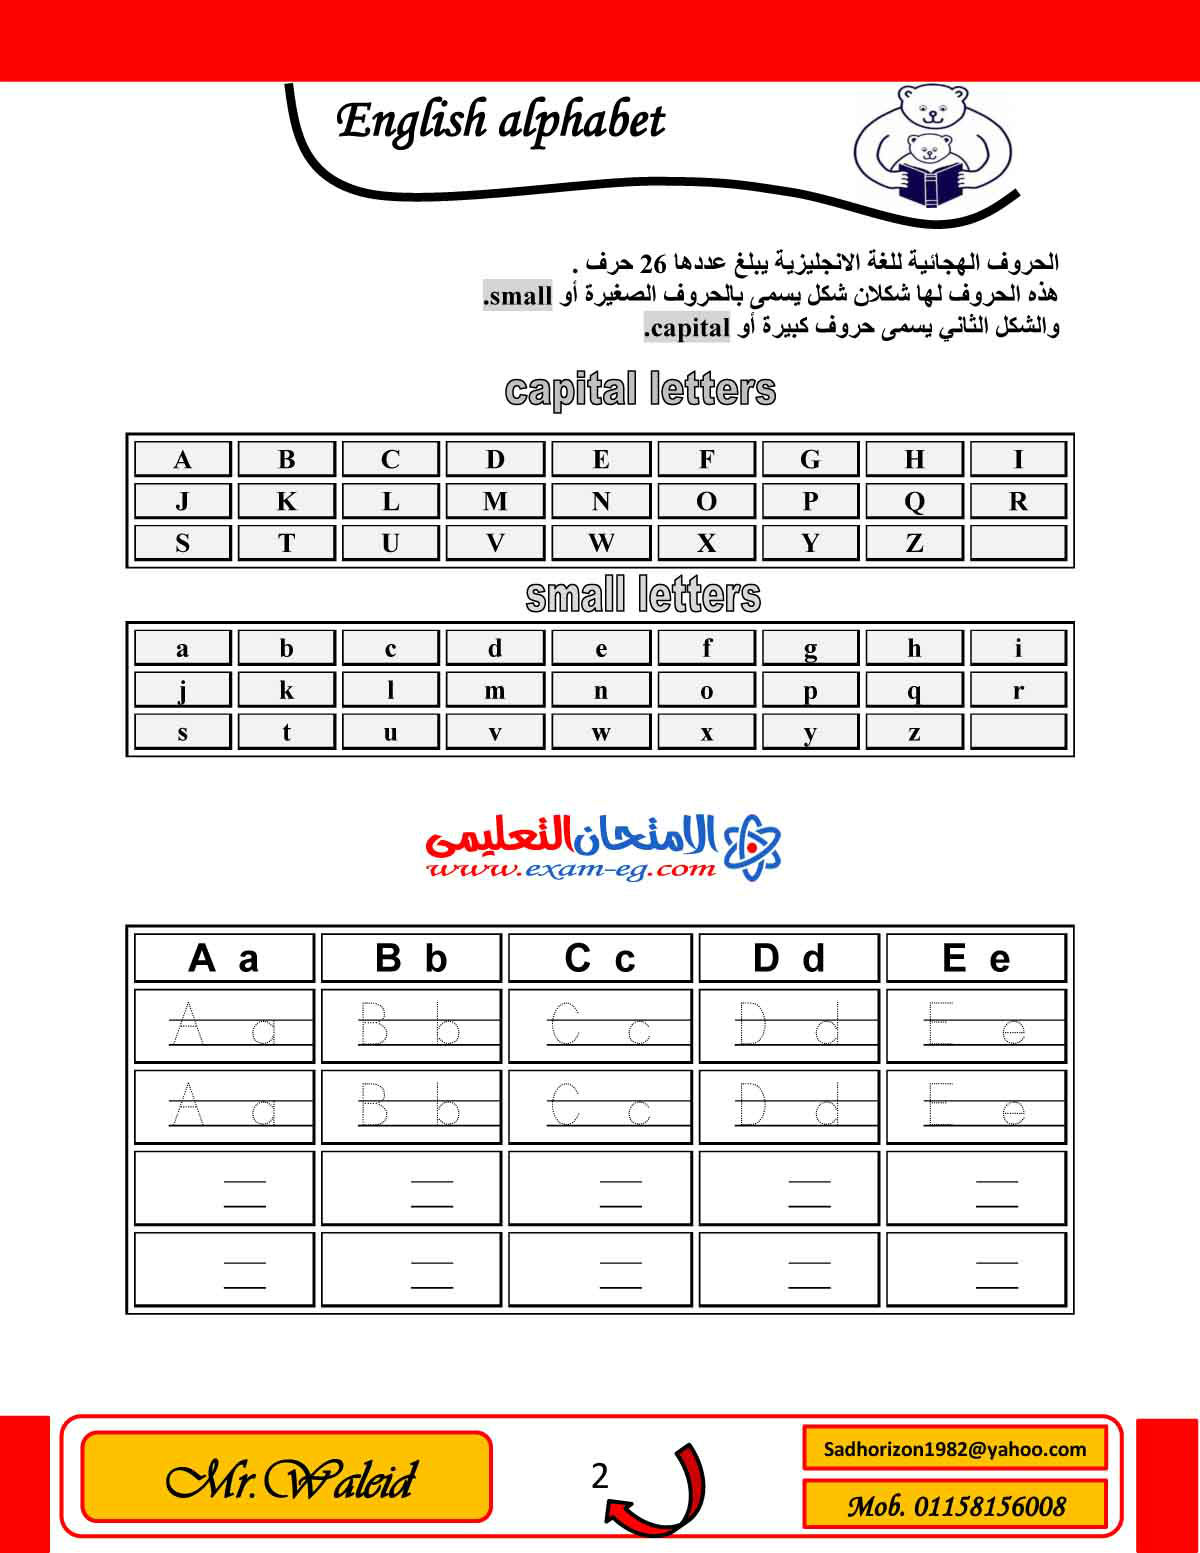 exam-eg.com_1449405243082.jpg